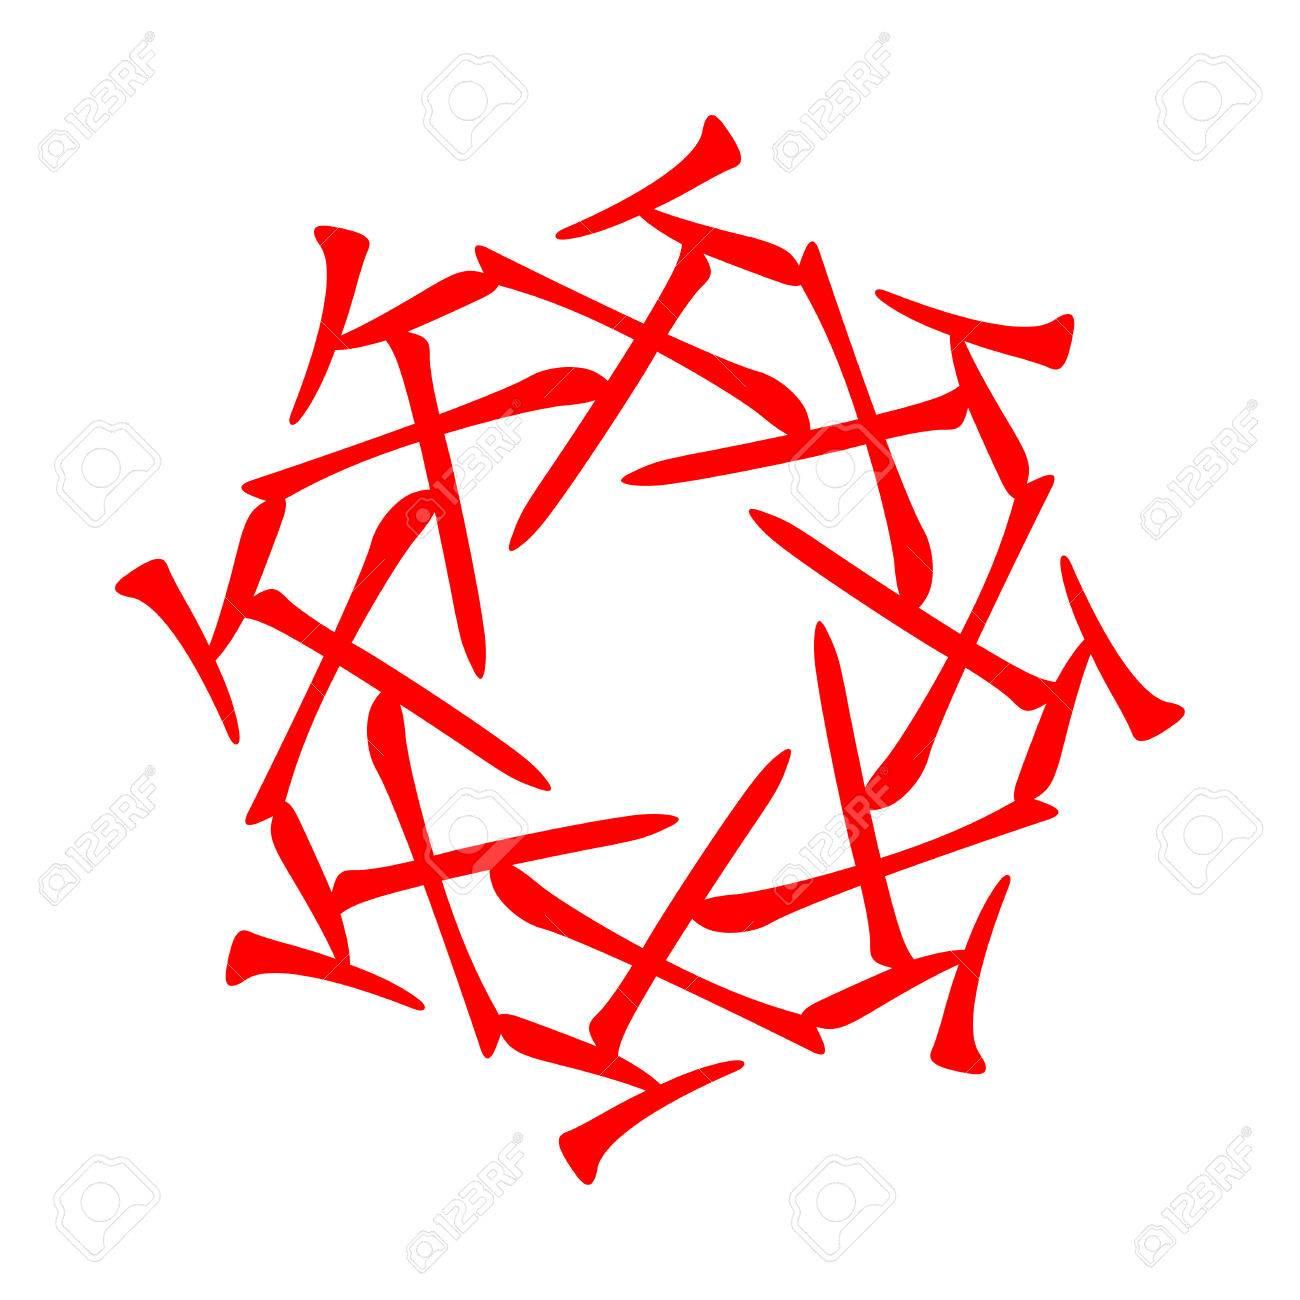 Symbol From Chinese Hieroglyphs Translation Of 12 Zodiac Animals